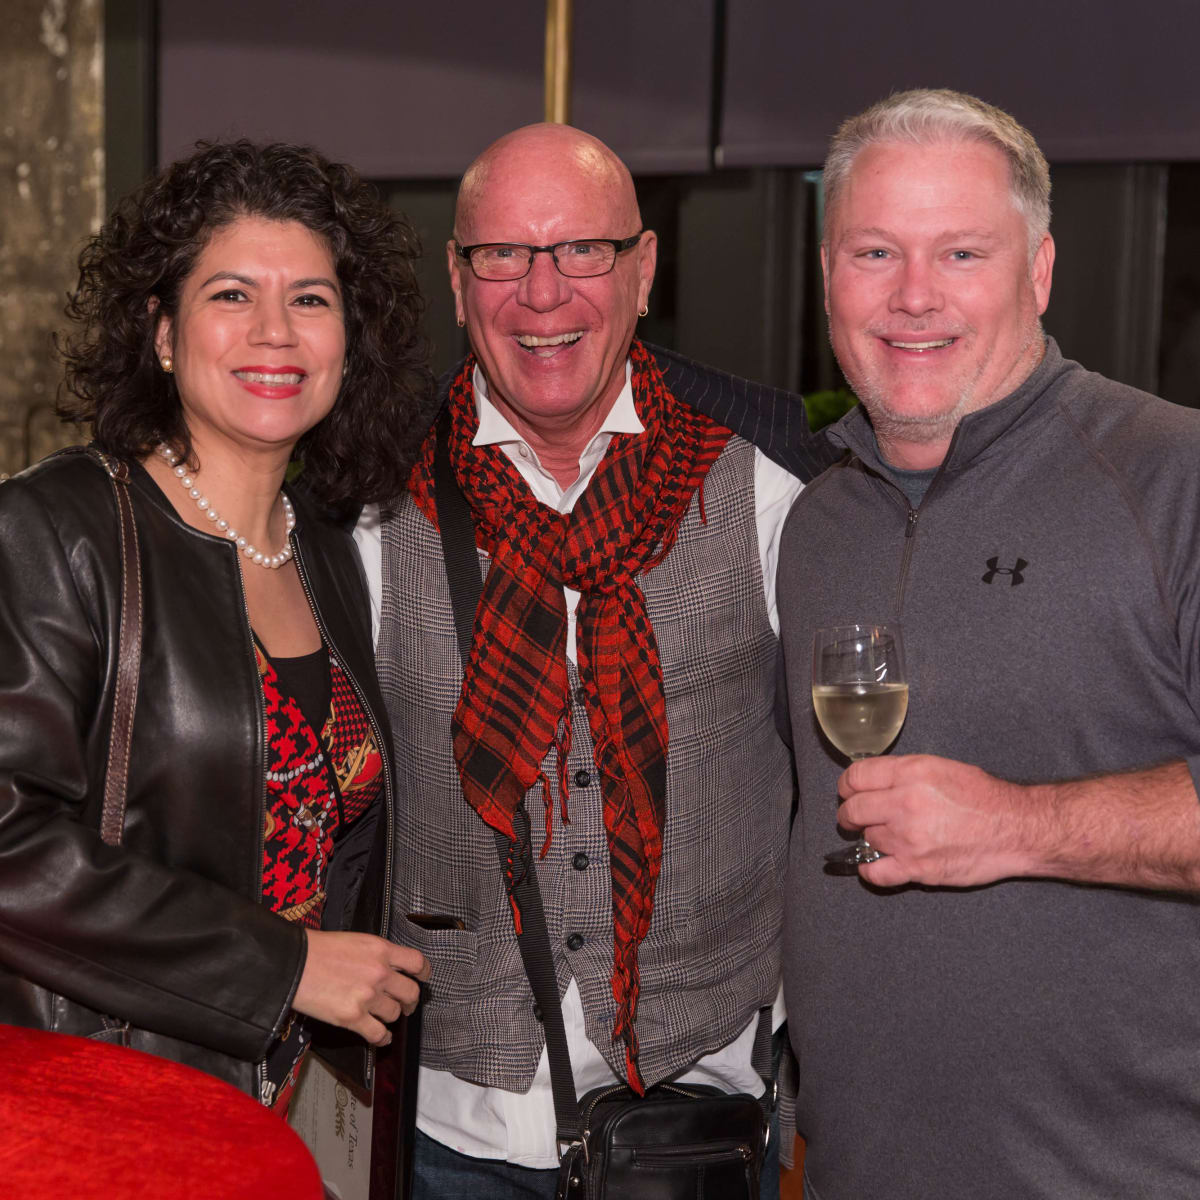 News, Lauren Spanjian party, Dec. 2015, State Rep. Carol Alvarado, Kelly Gale Amen, Greg Bess